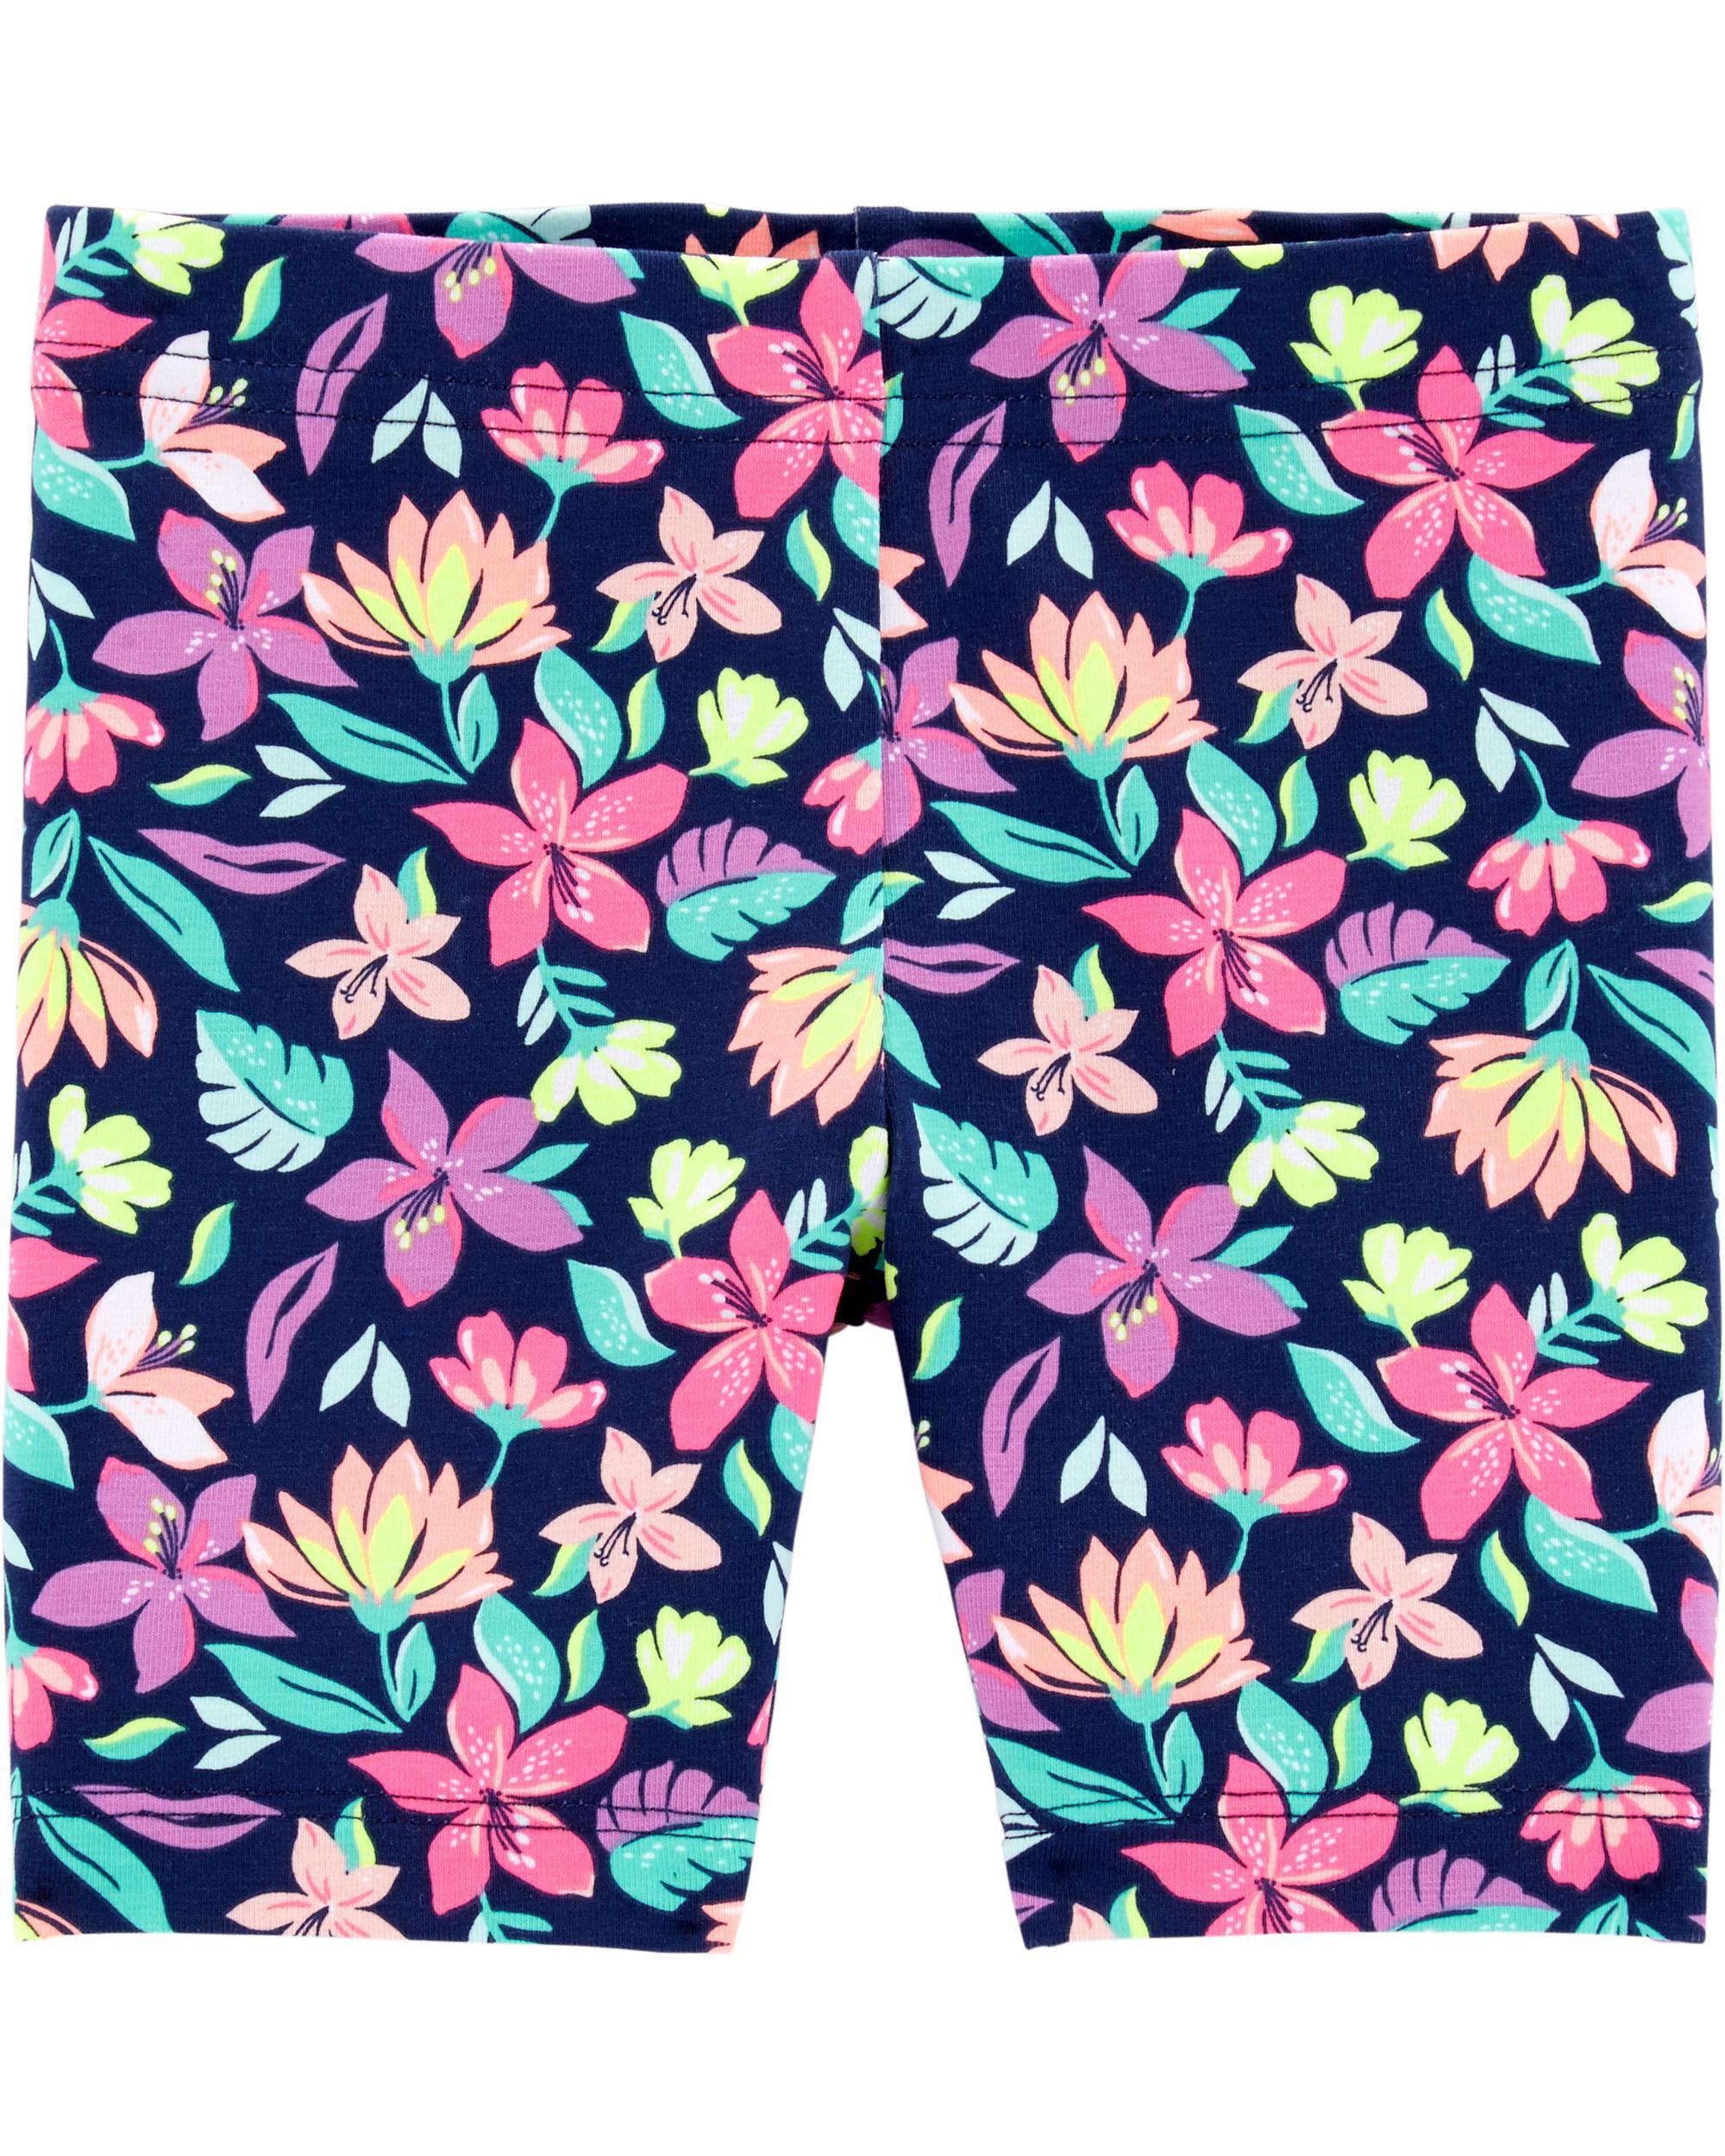 Carters Baby Girls 2-Pack Tumbling Shorts Black//White